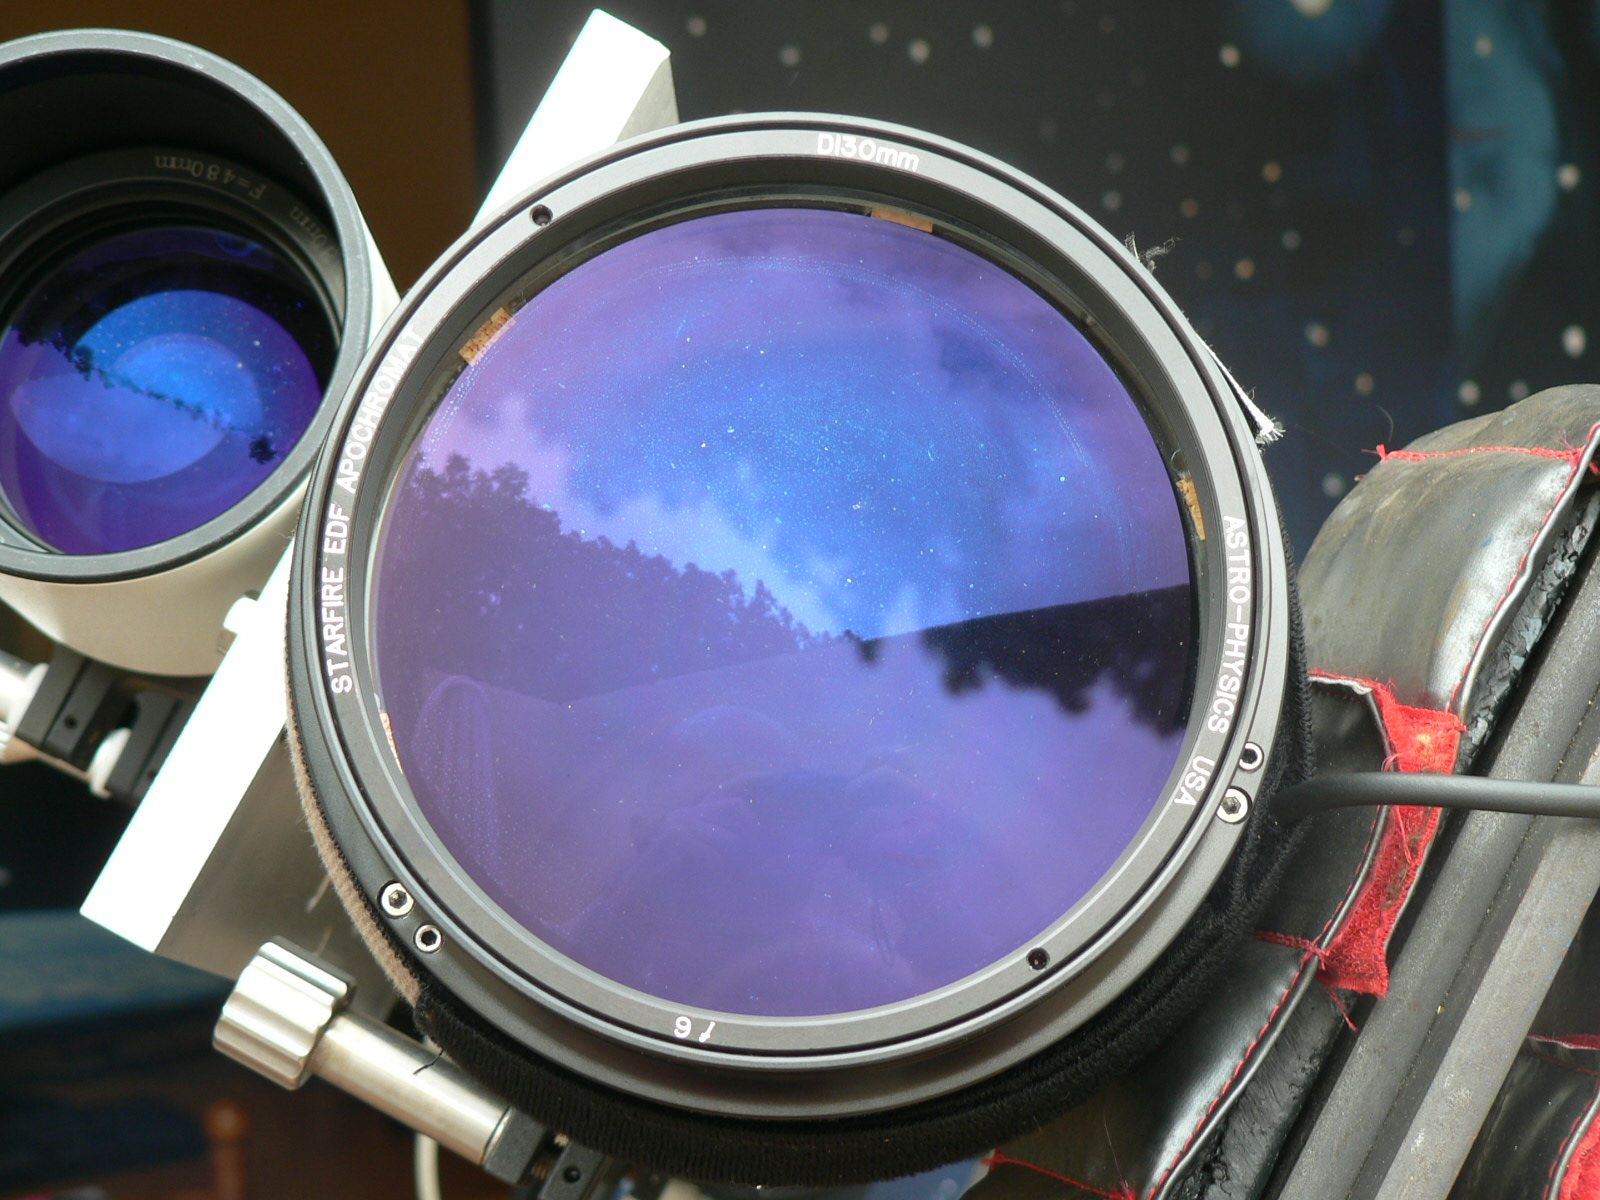 Astromart classifieds telescope refractor astro physics ap 130